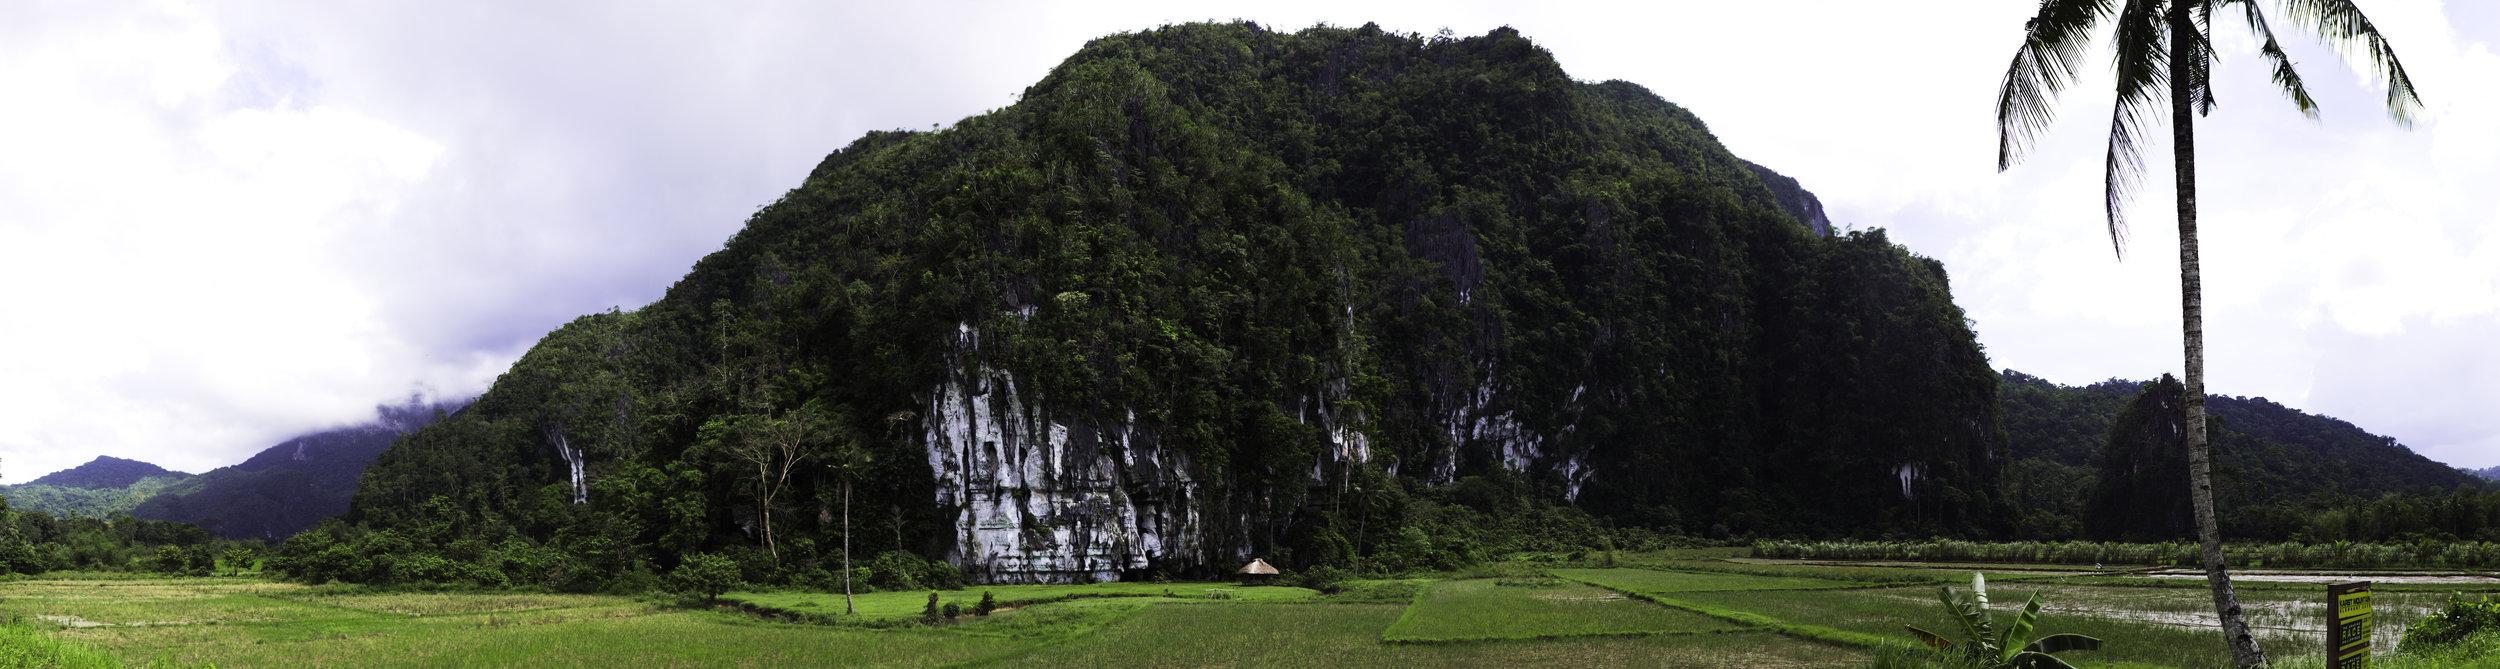 Karst Mountain, Elephant Cave